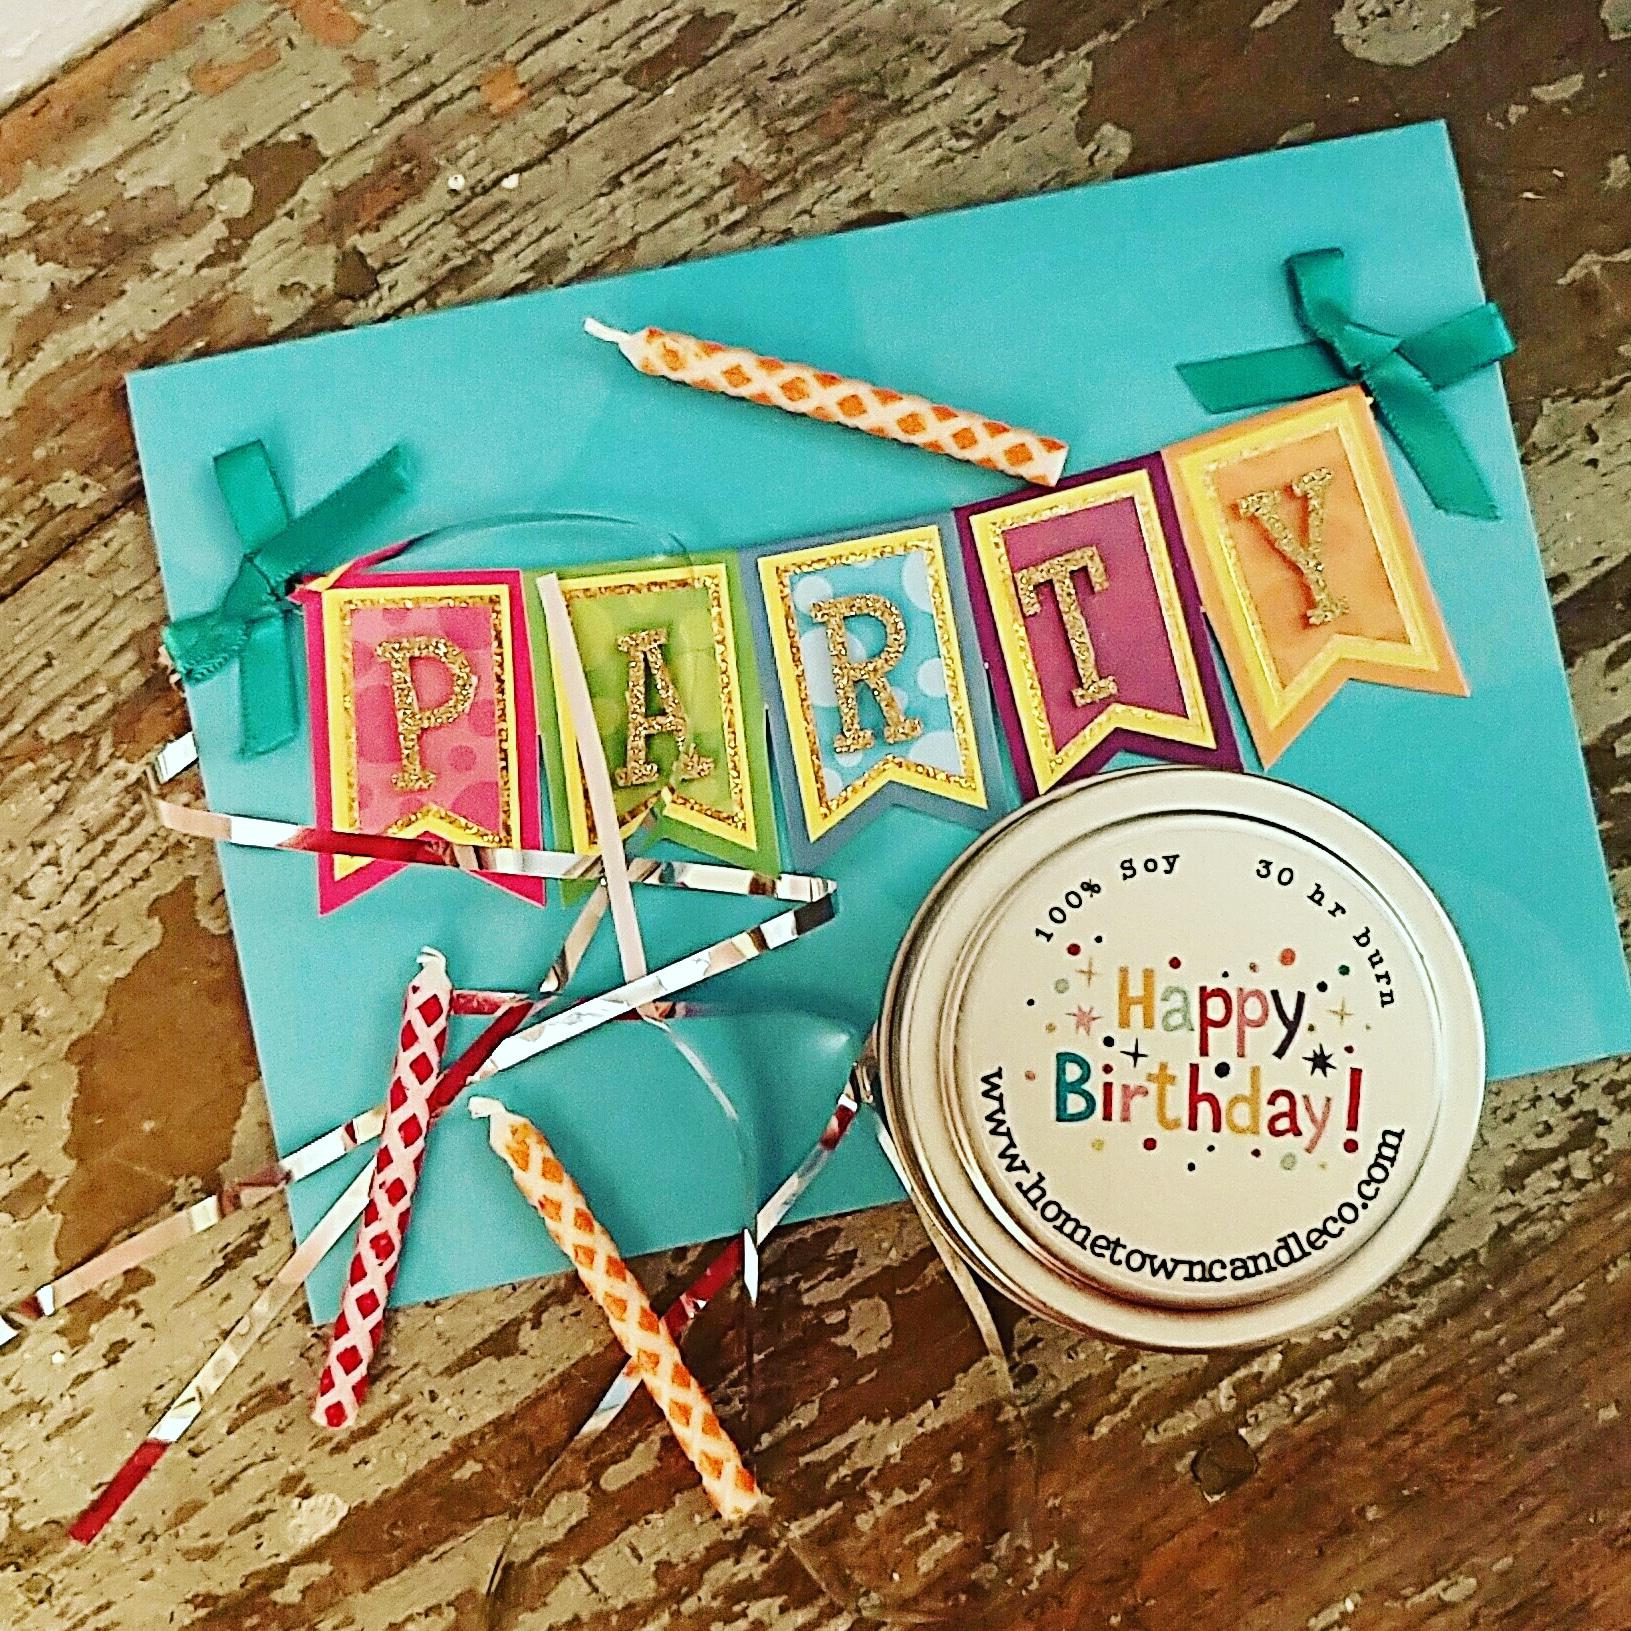 birthday candle.jpg